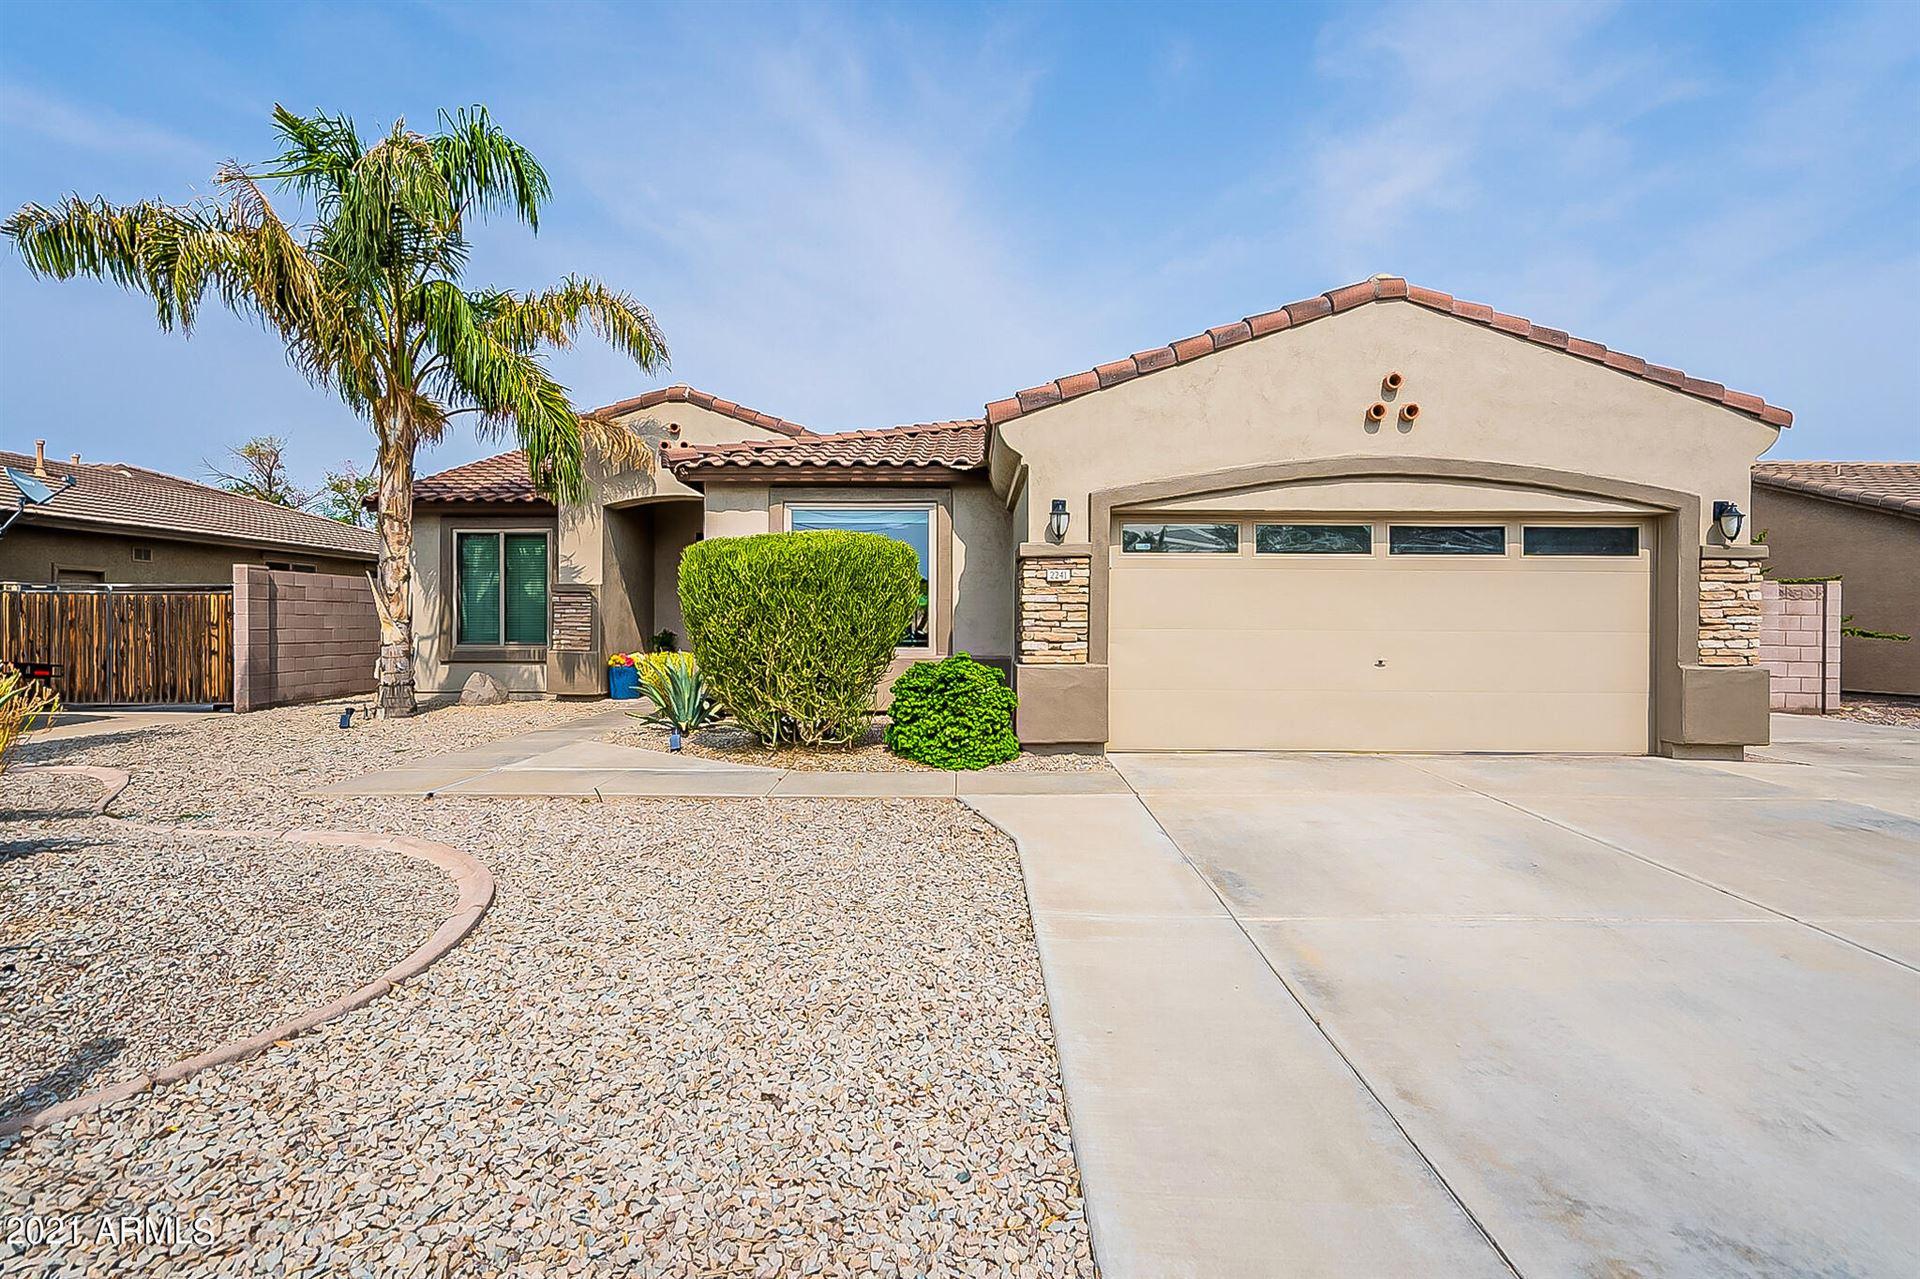 Photo of 2241 S PORTLAND Avenue, Gilbert, AZ 85295 (MLS # 6268870)